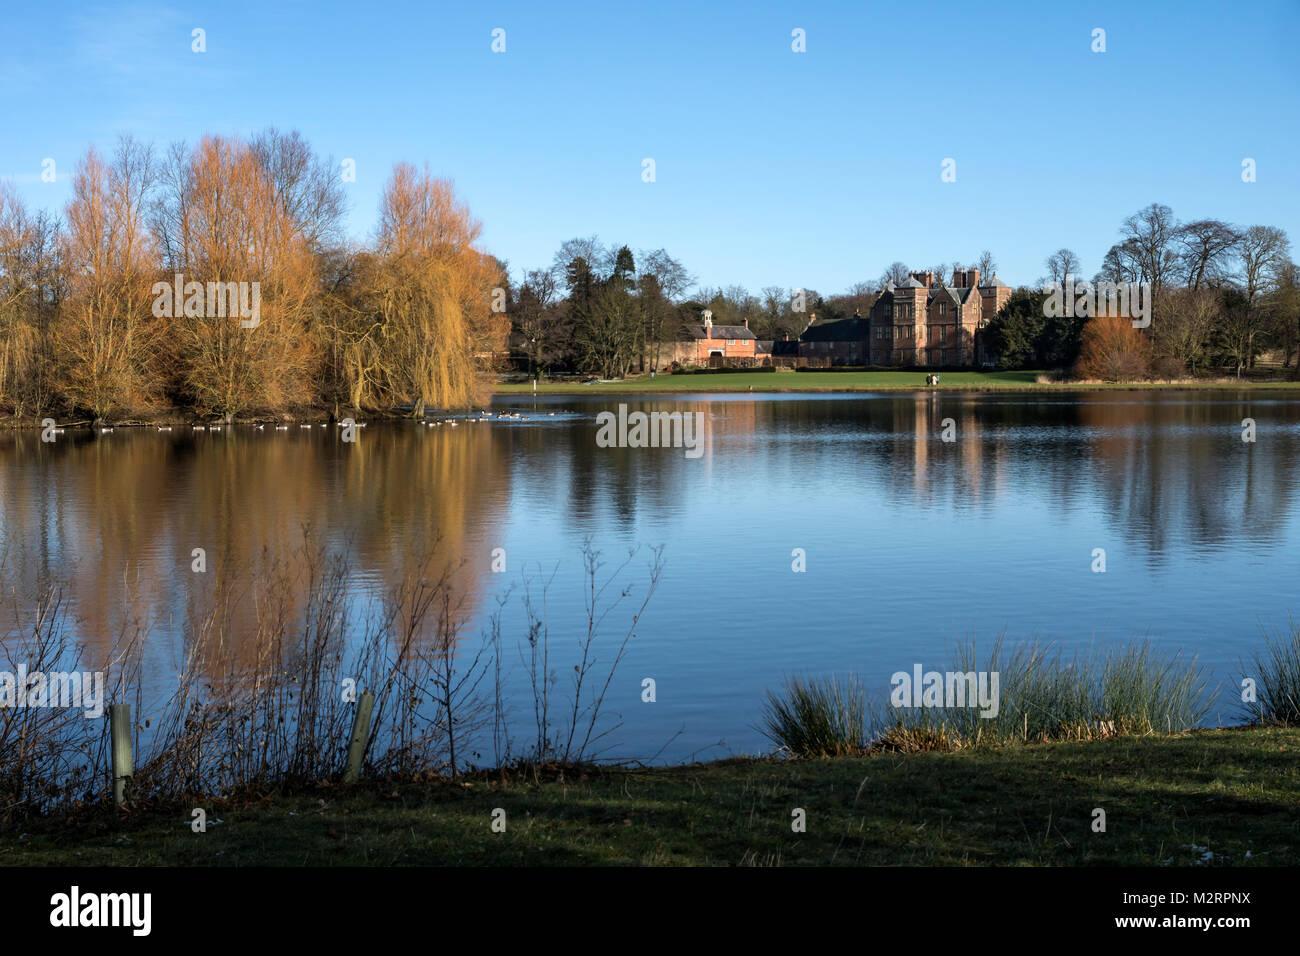 Kiplin Hall, North Yorkshire. Seen from the fishing lake. Stock Photo